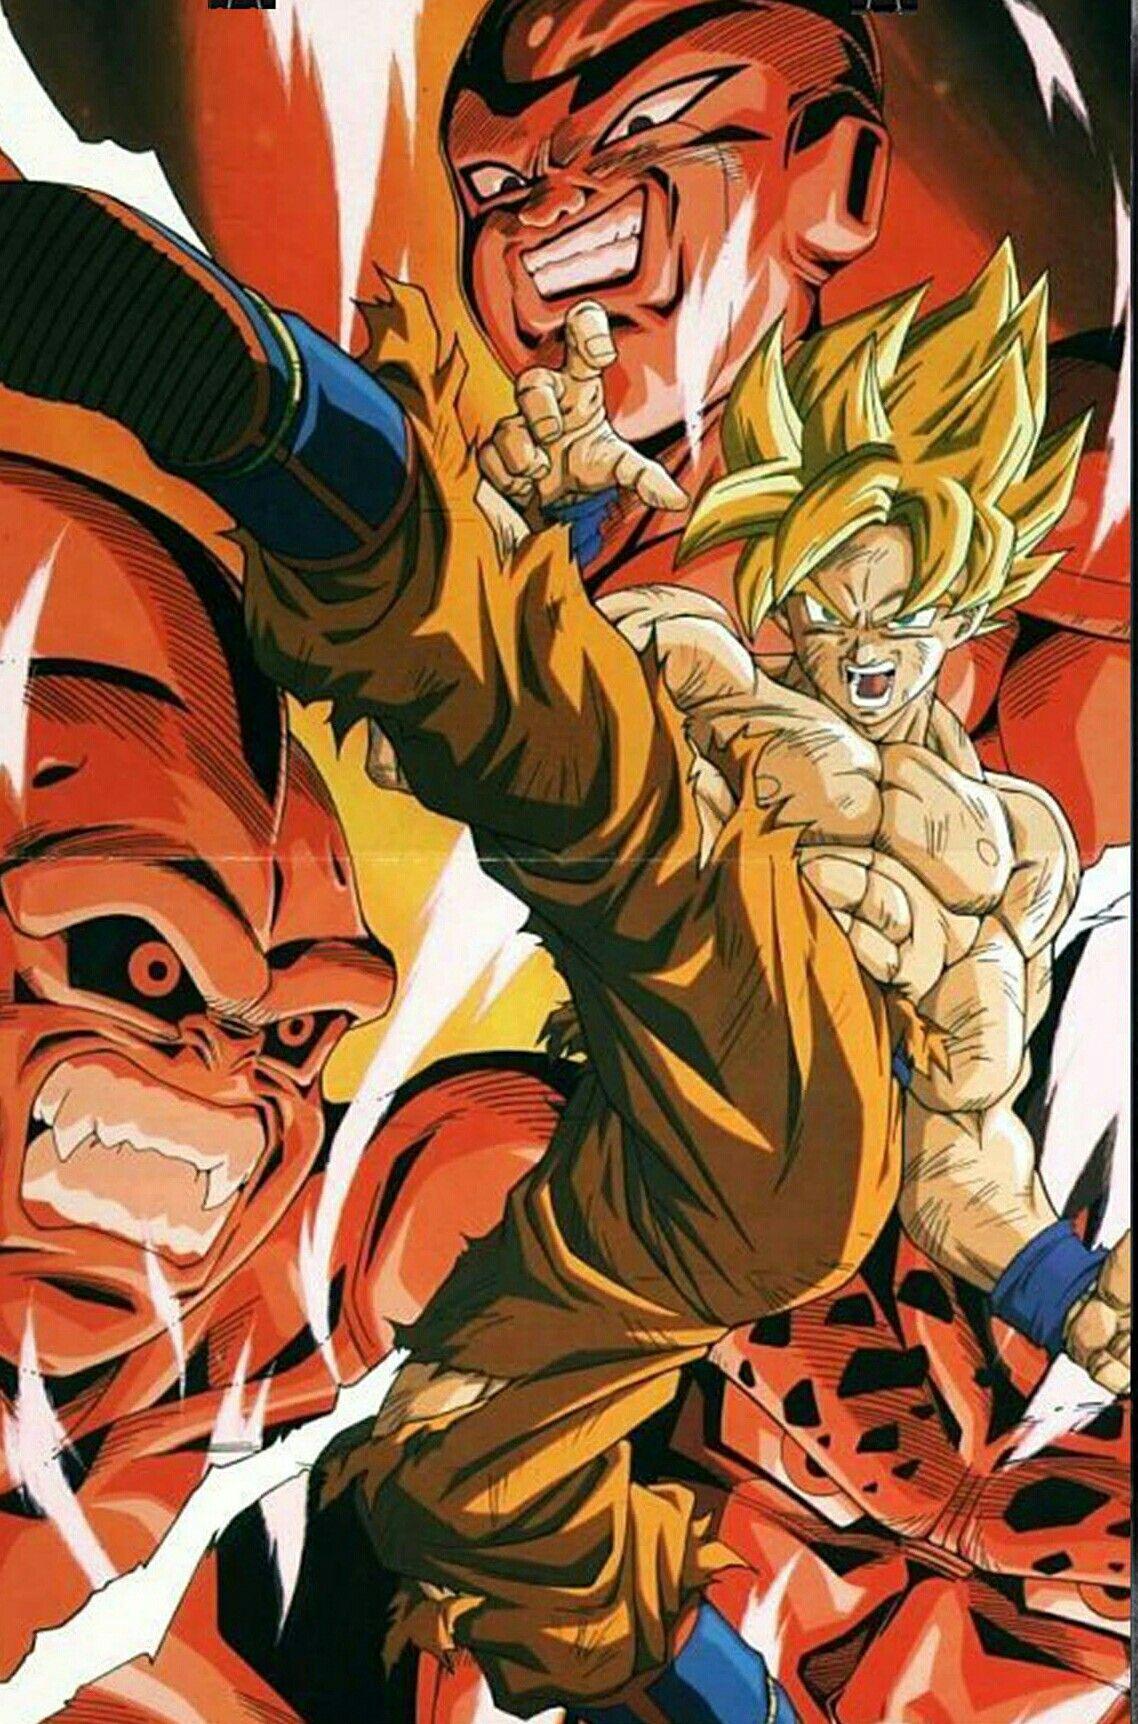 Pin By Laszlo Domonkos On Dragon Ball Dragon Ball Gt Anime Dragon Ball Dragon Ball Art